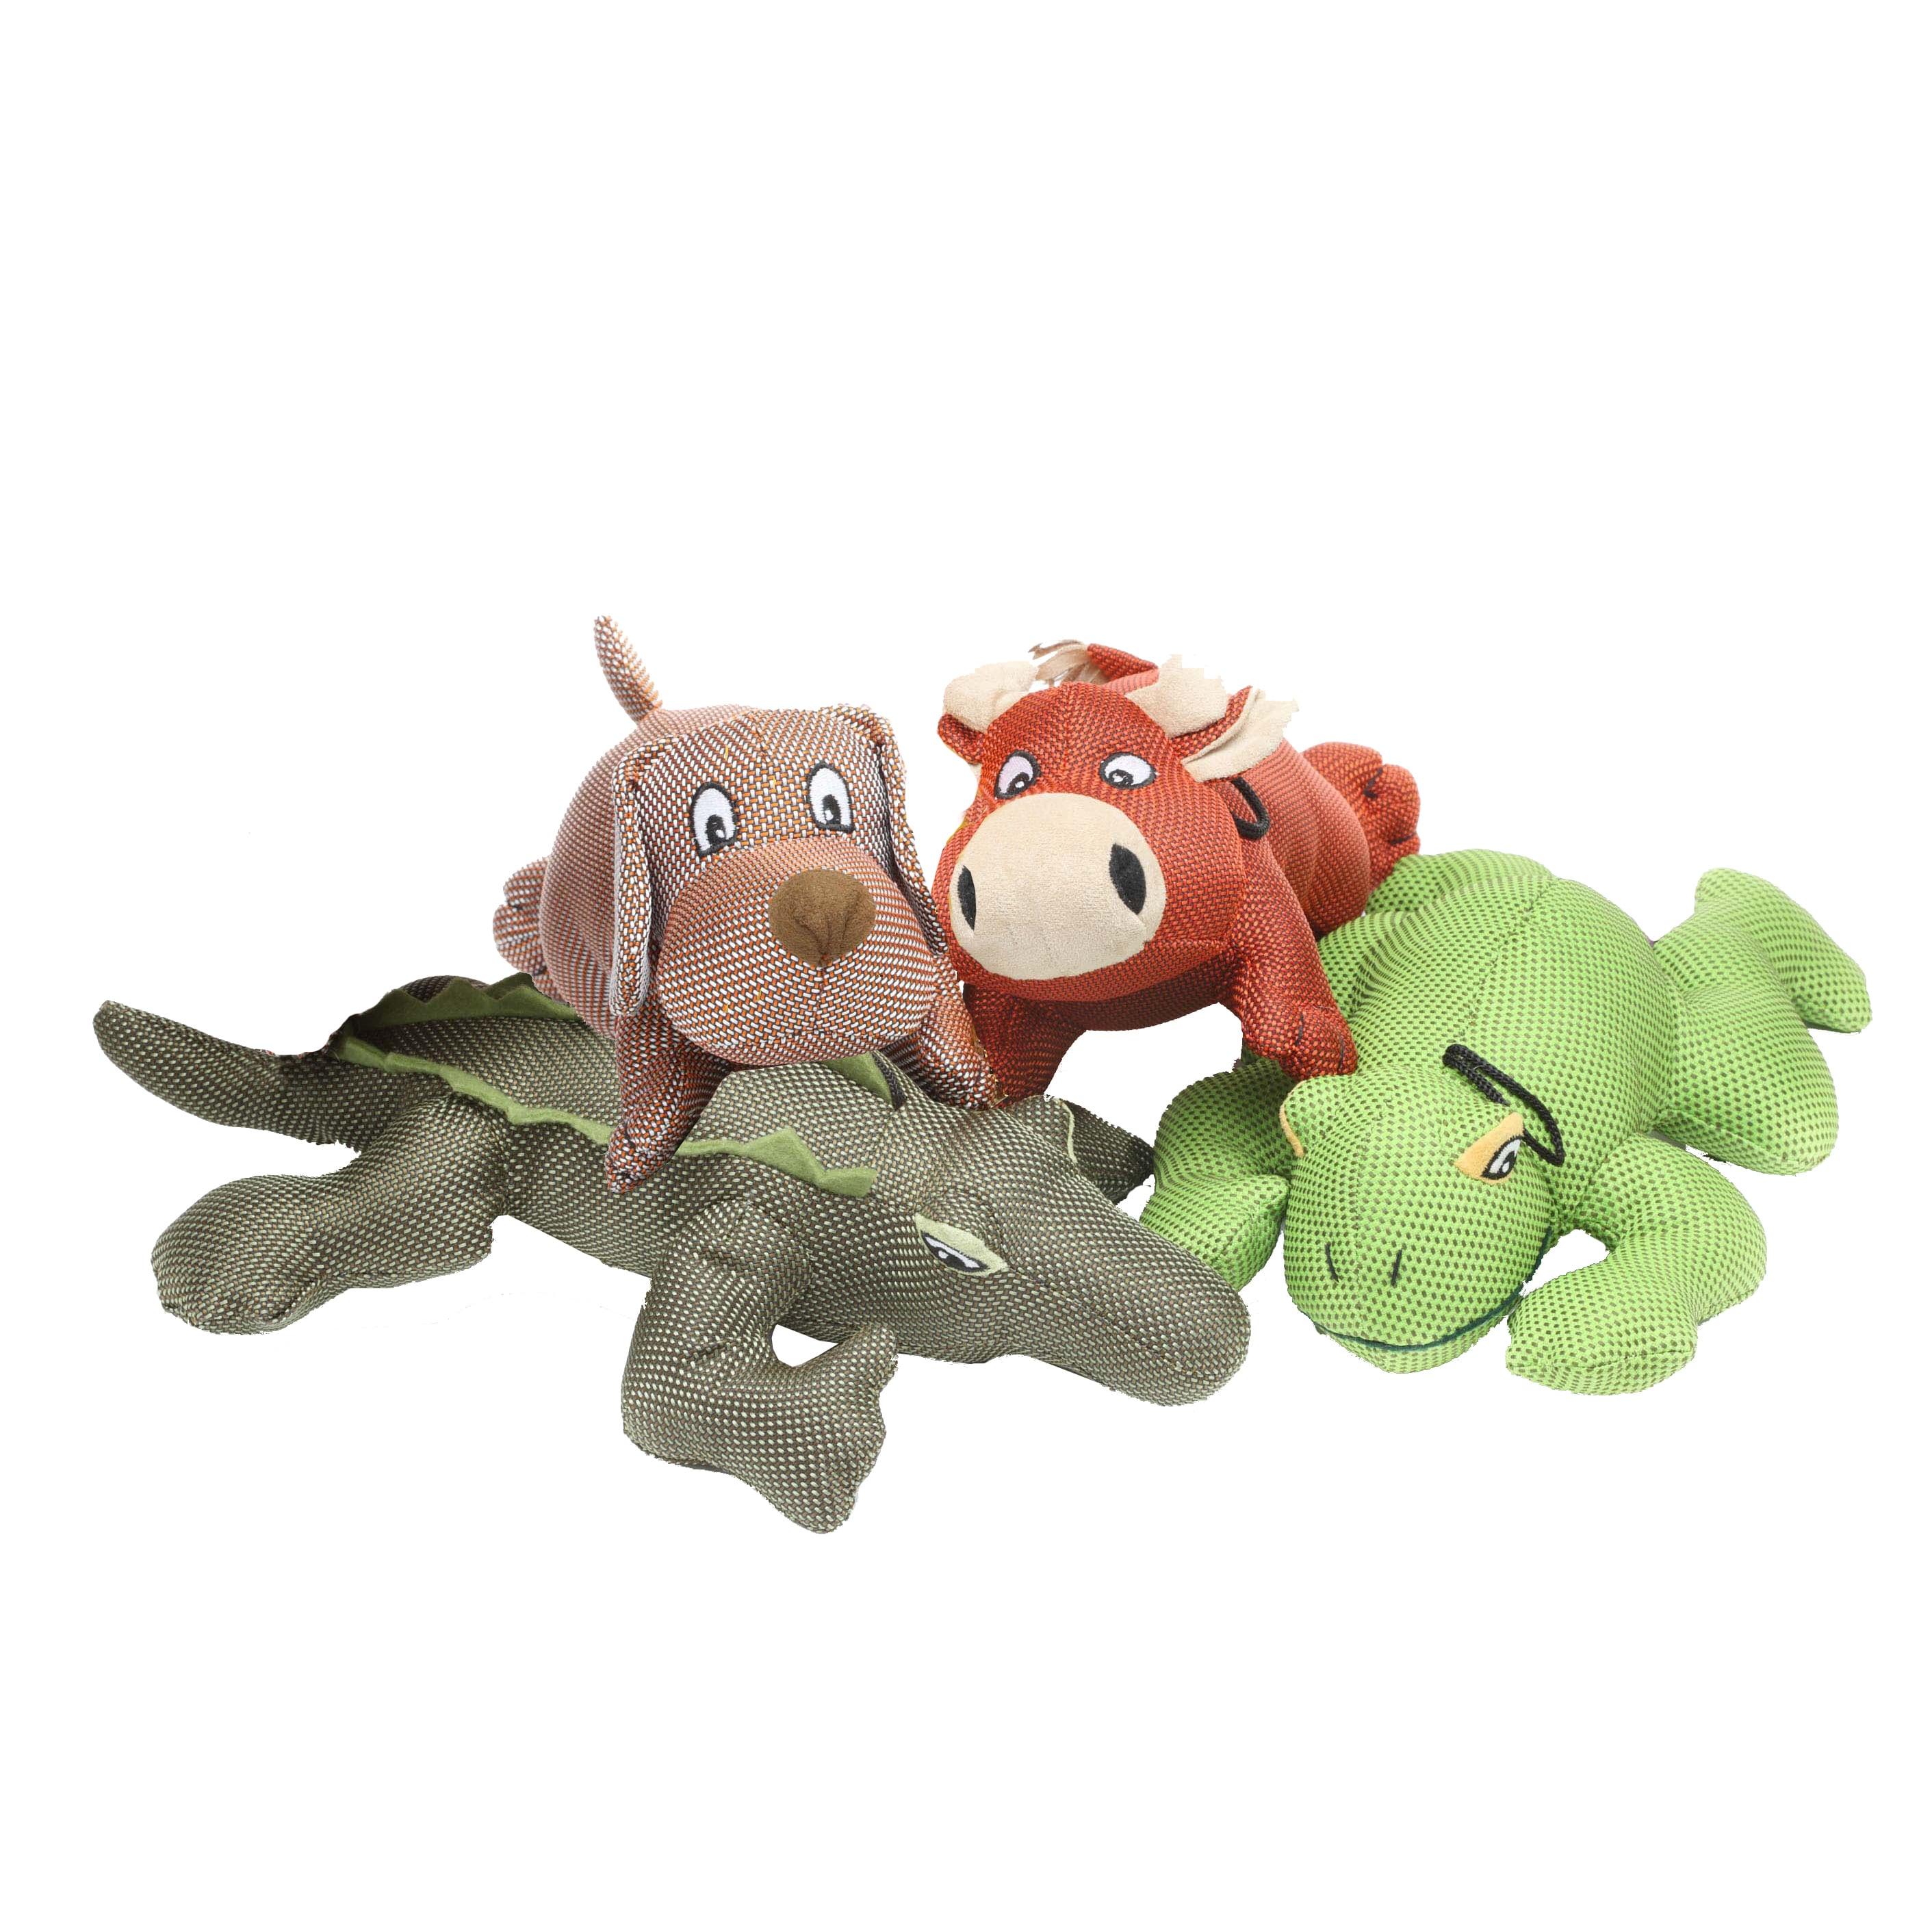 Kong Ballistic Tug Dog Toy: Ballistic Nylon Dog Toys